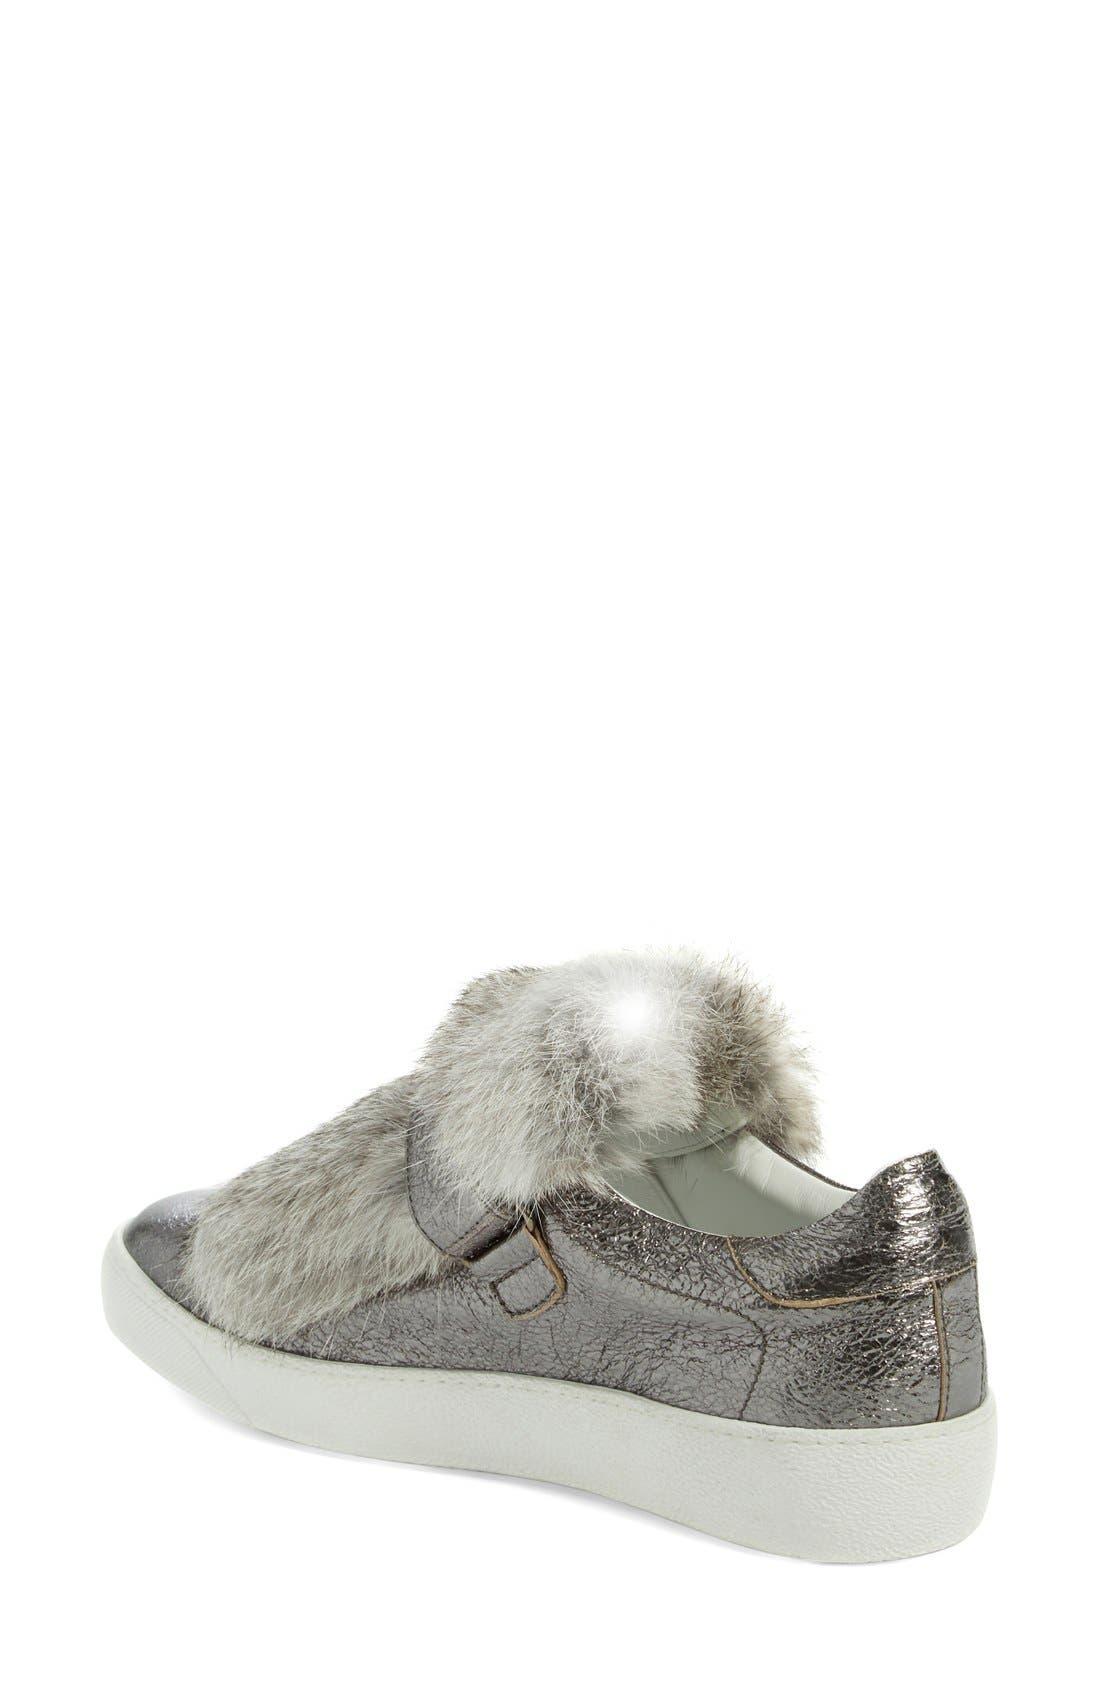 MONCLER, 'Lucie Scarpa' Genuine Rabbit Fur Trim Sneaker, Alternate thumbnail 6, color, 020